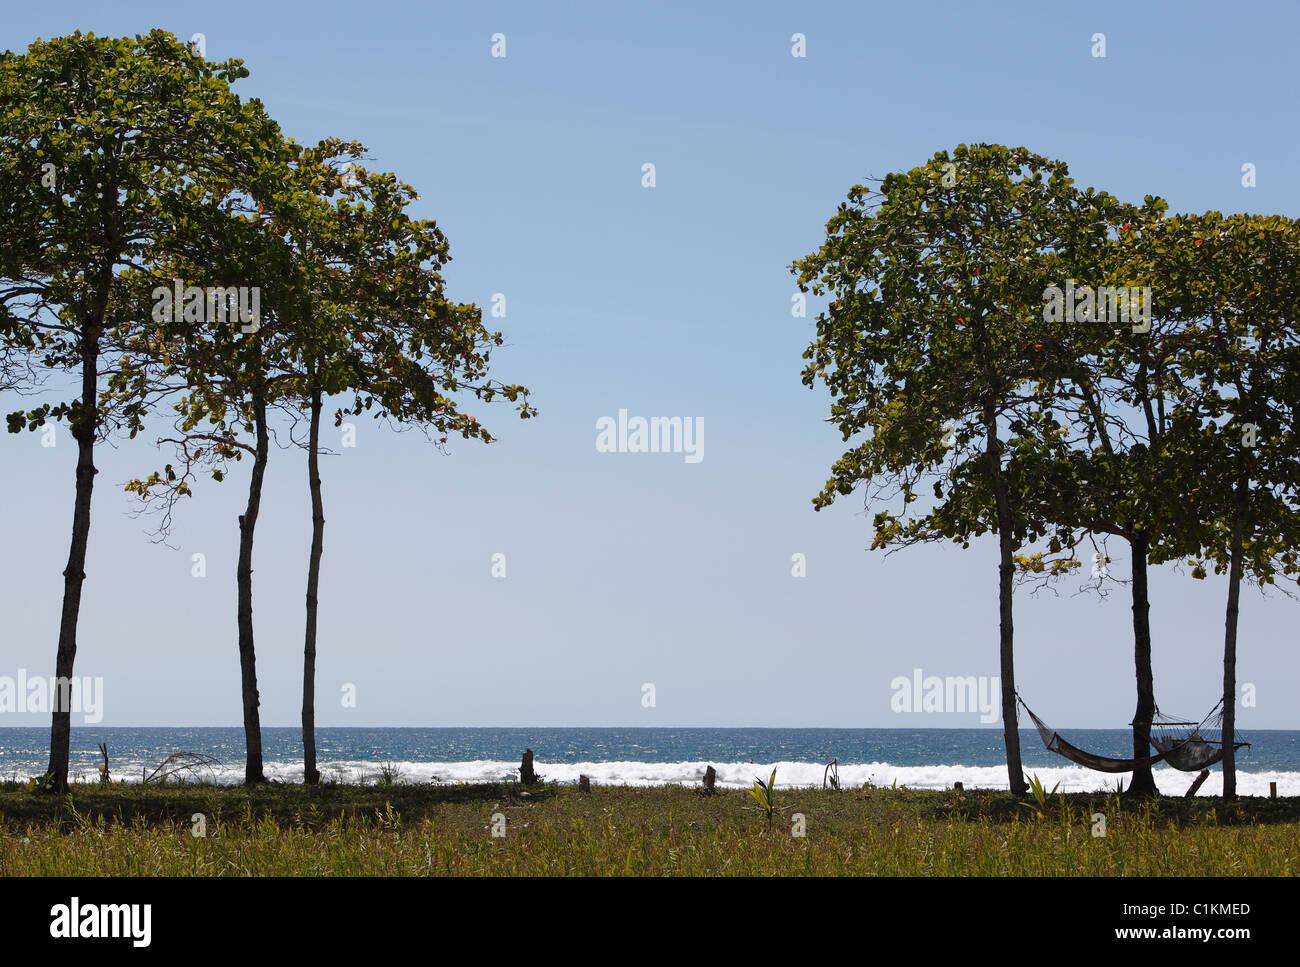 Hammocks under the trees on the beach, Playa San Miguel, Nicoya Peninsula, Costa Rica - Stock Image